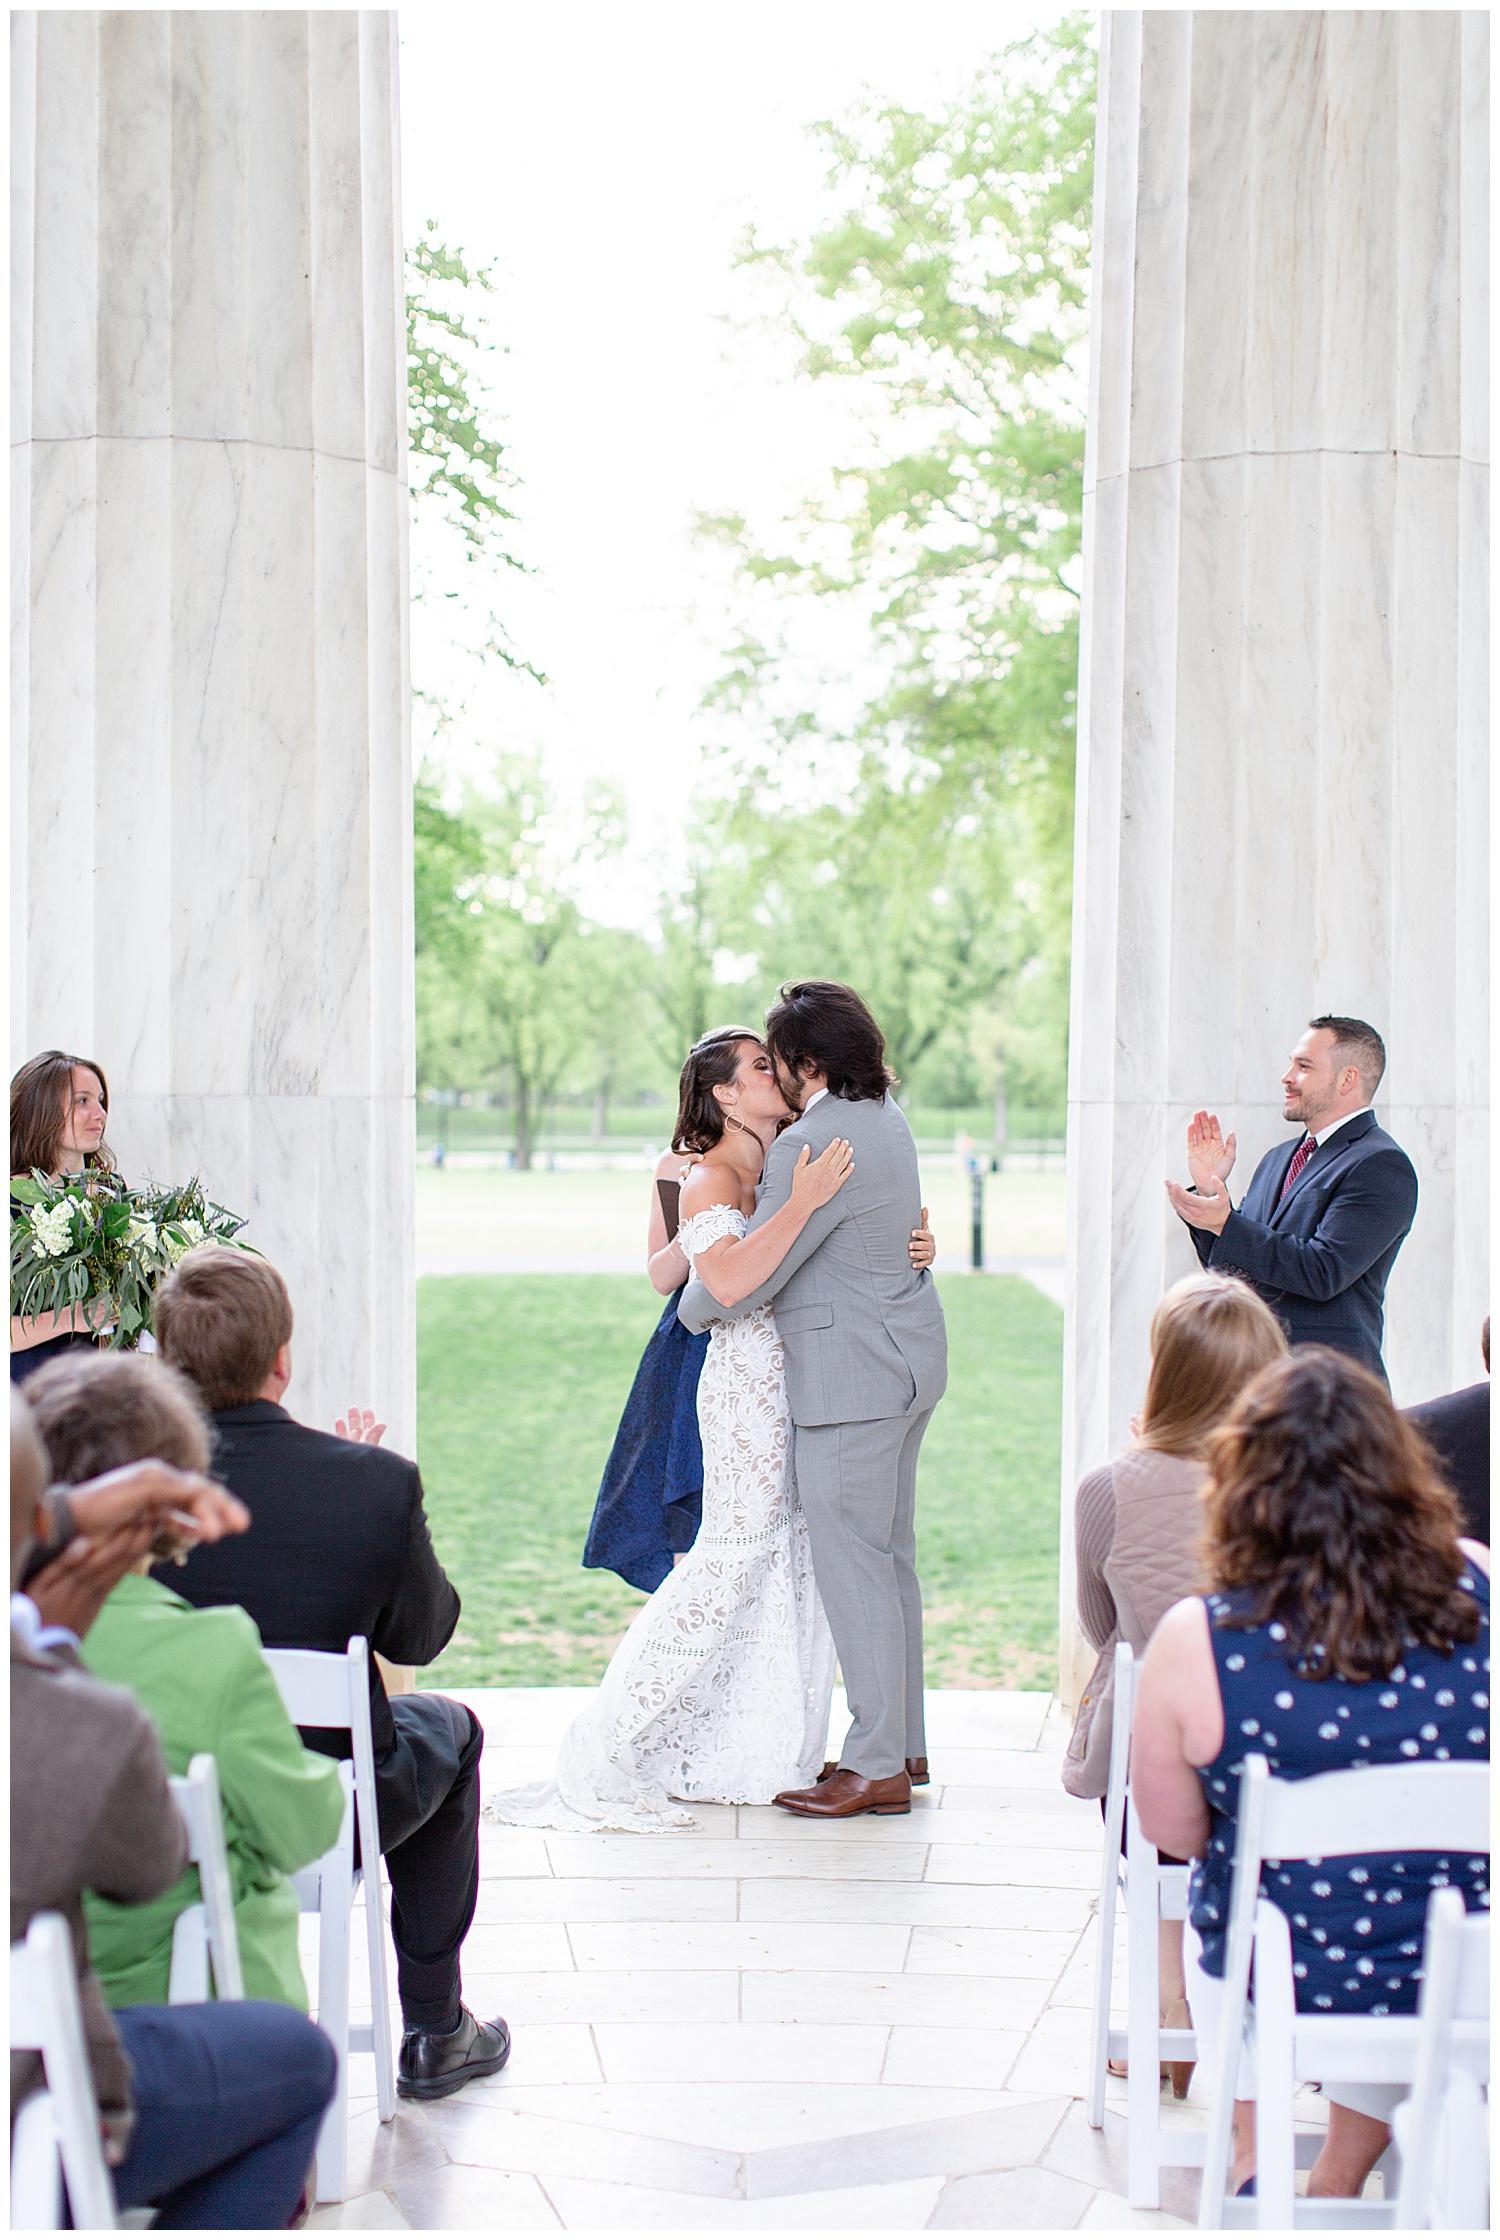 emily-belson-photography-washington-dc-wedding-16.jpg